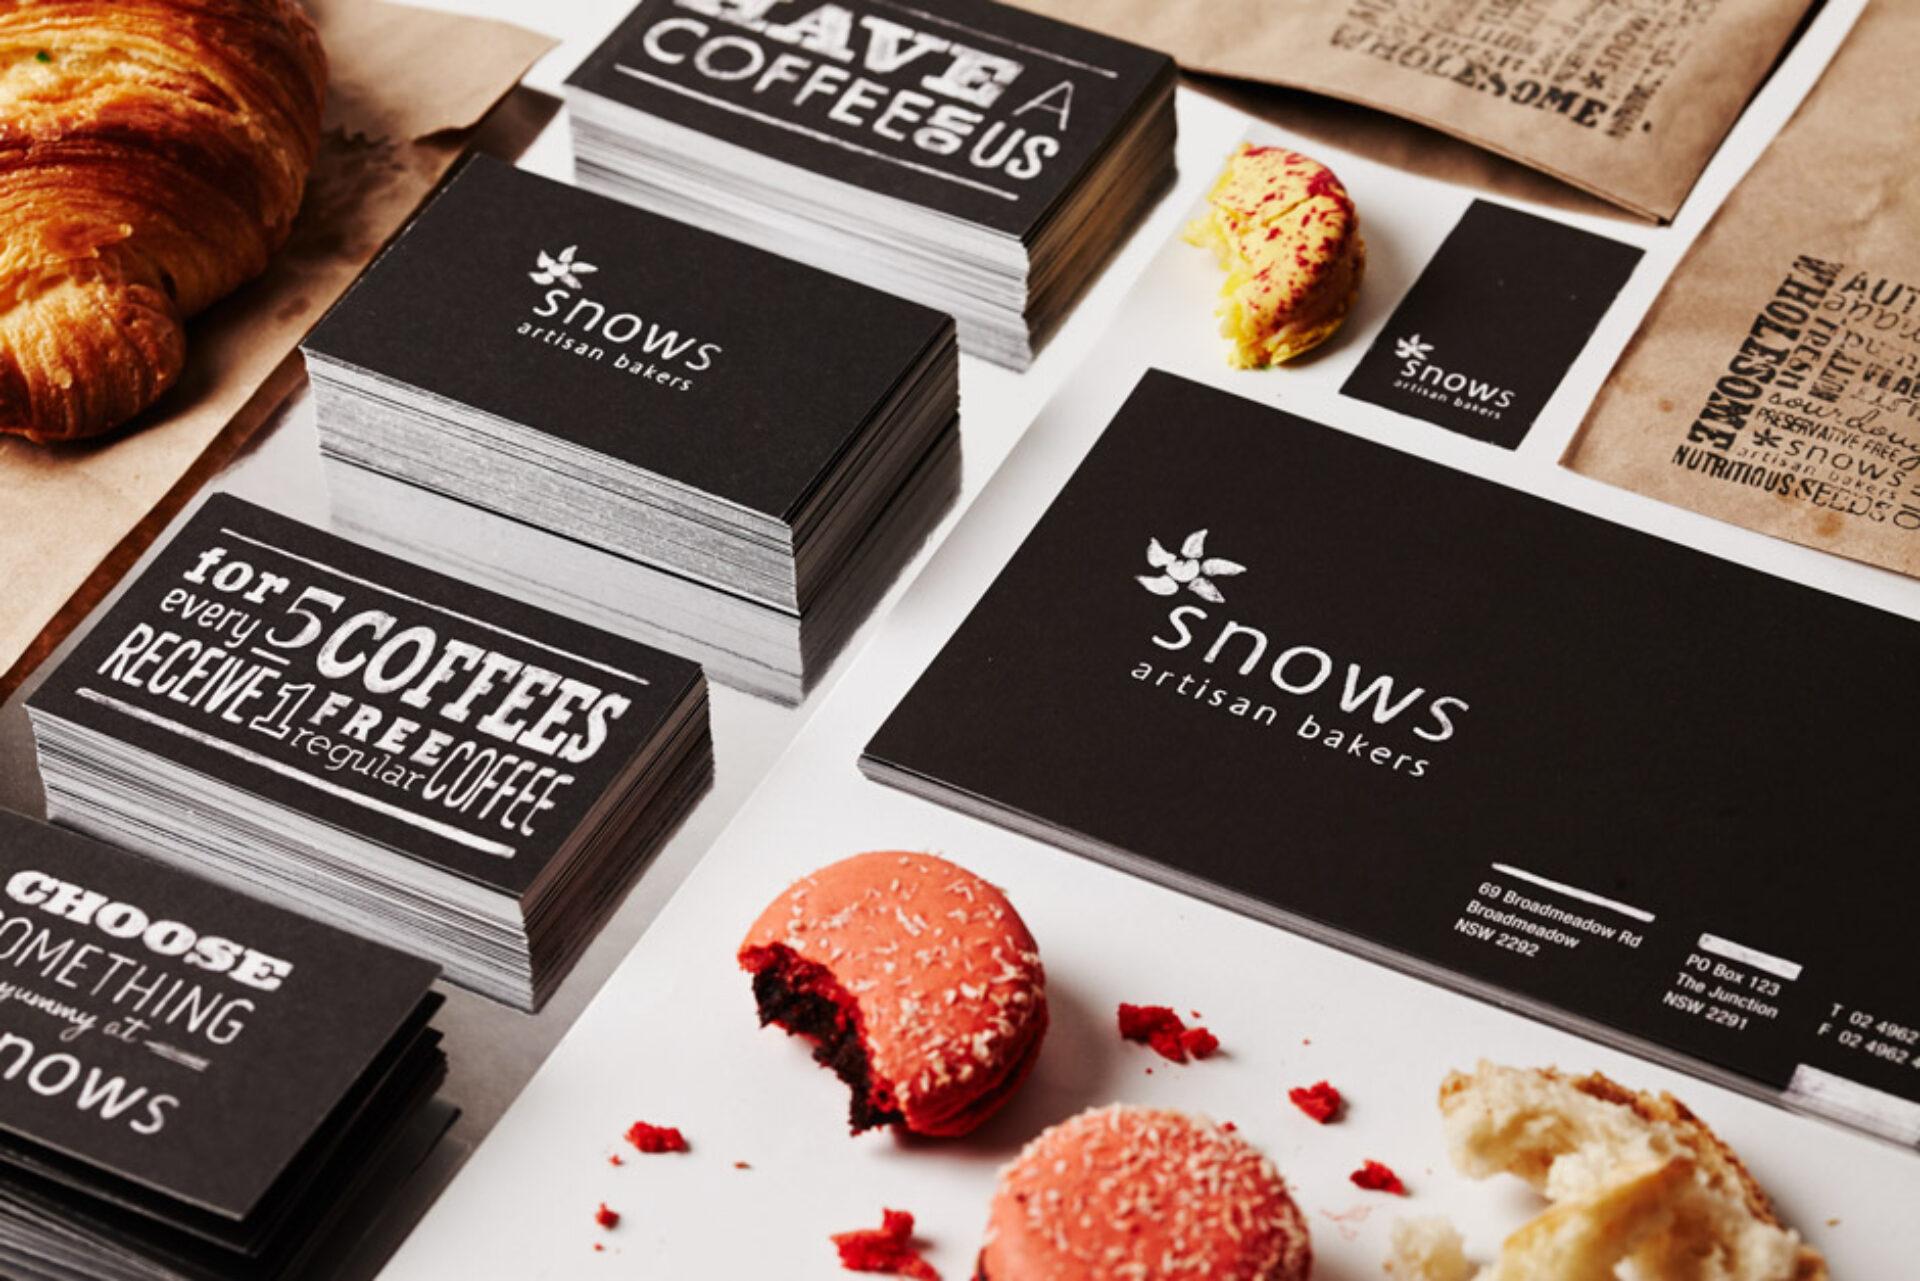 Snows artisan bakers 03